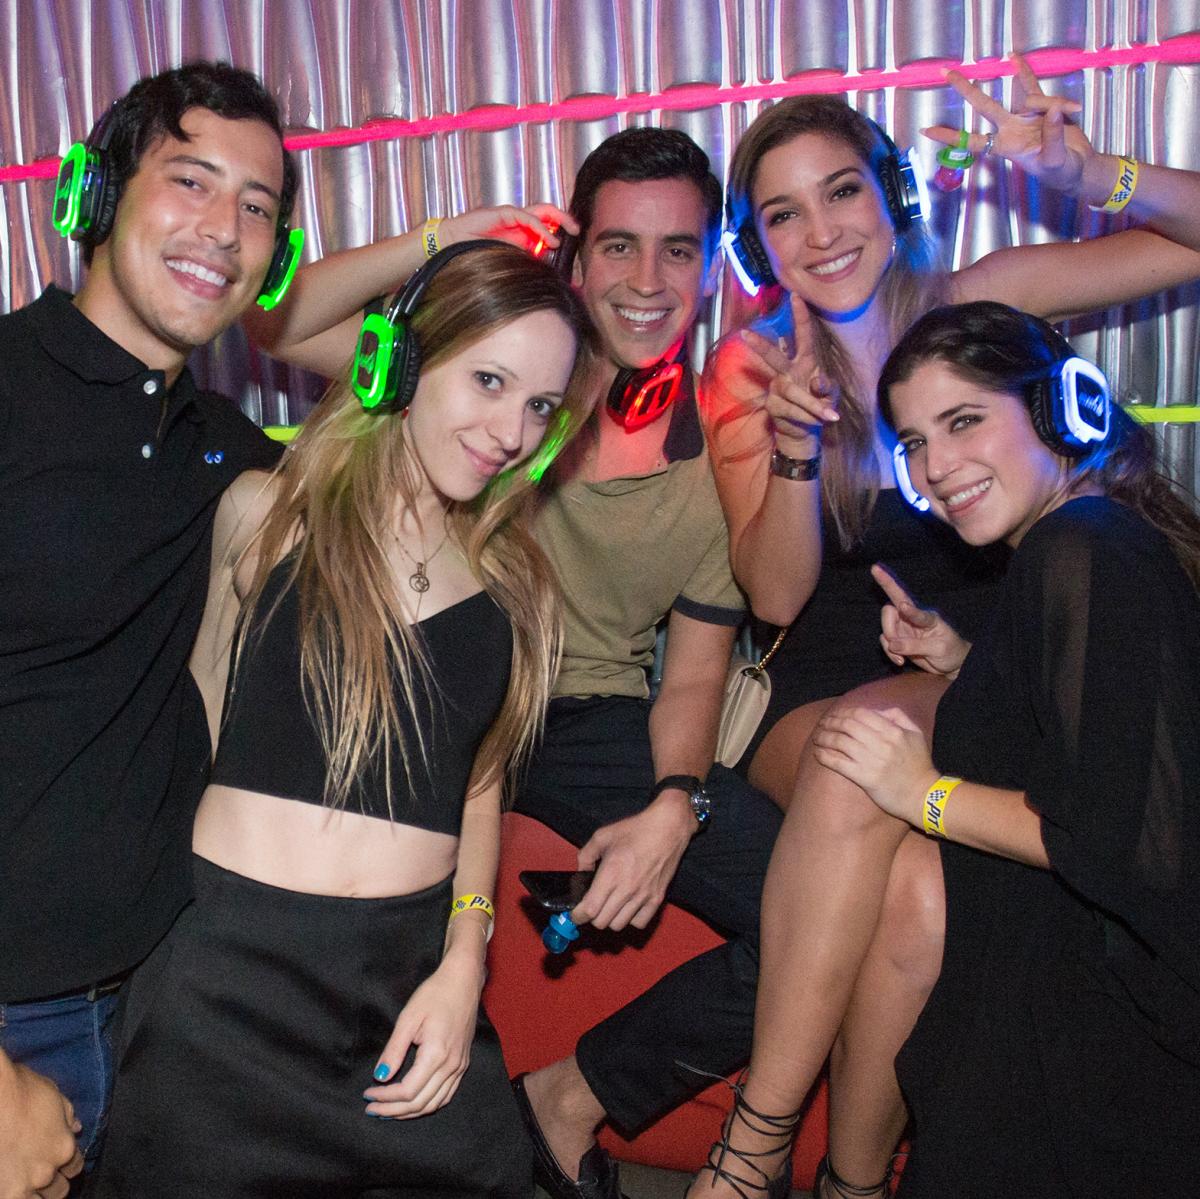 Horacio Moros, Eugenia Garza, Roberto Quiroz Mata, Ana Herrera, Dany Herrera